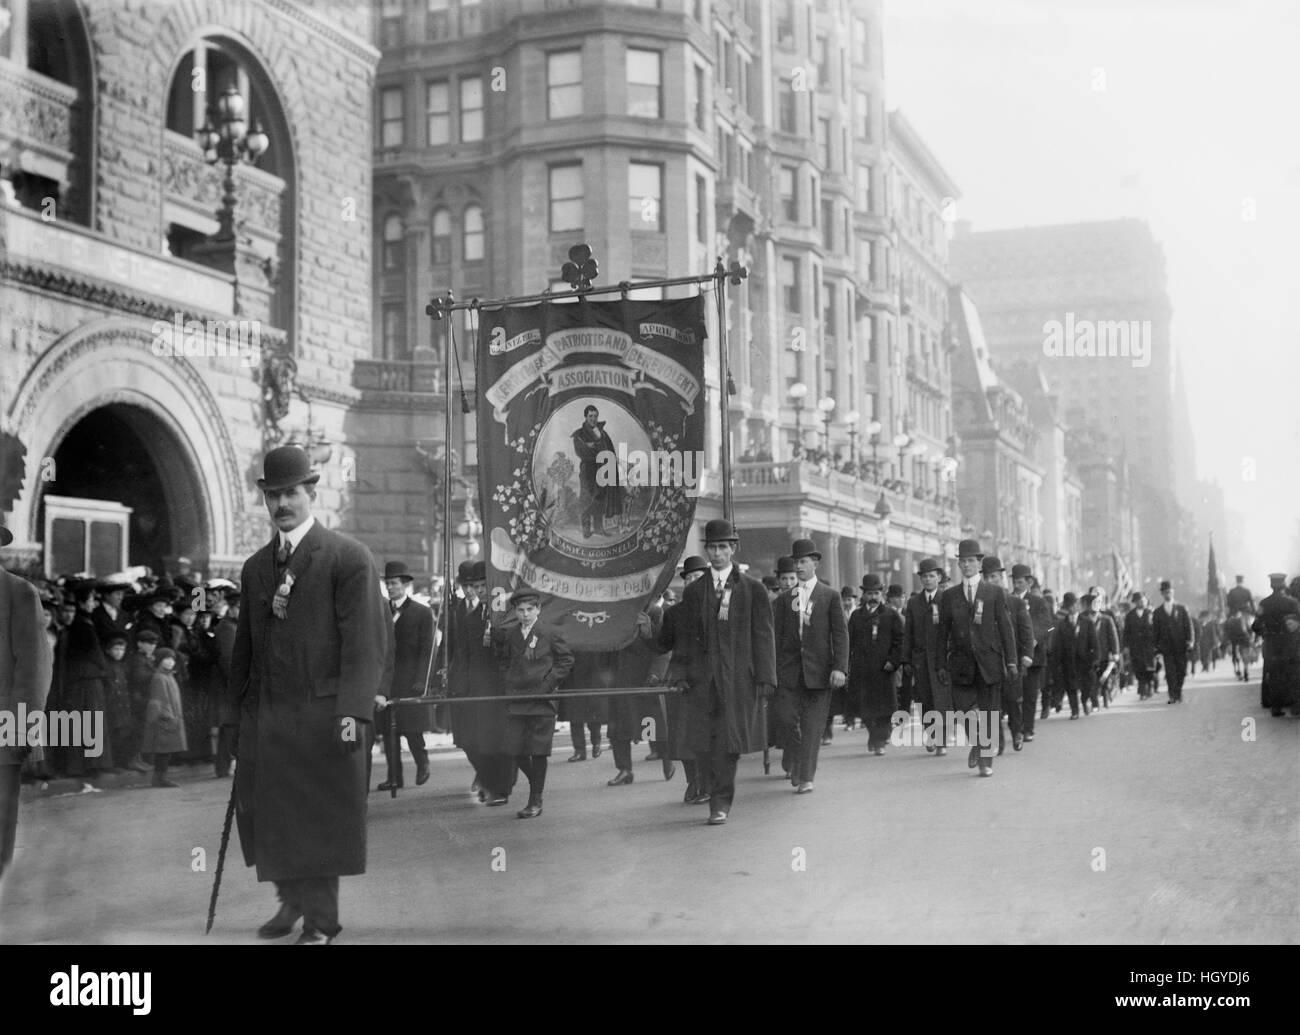 St. Patrick Parade, Fifth Avenue, New York City, New York, USA, Bain Nachrichtendienst, März 1909 Stockbild